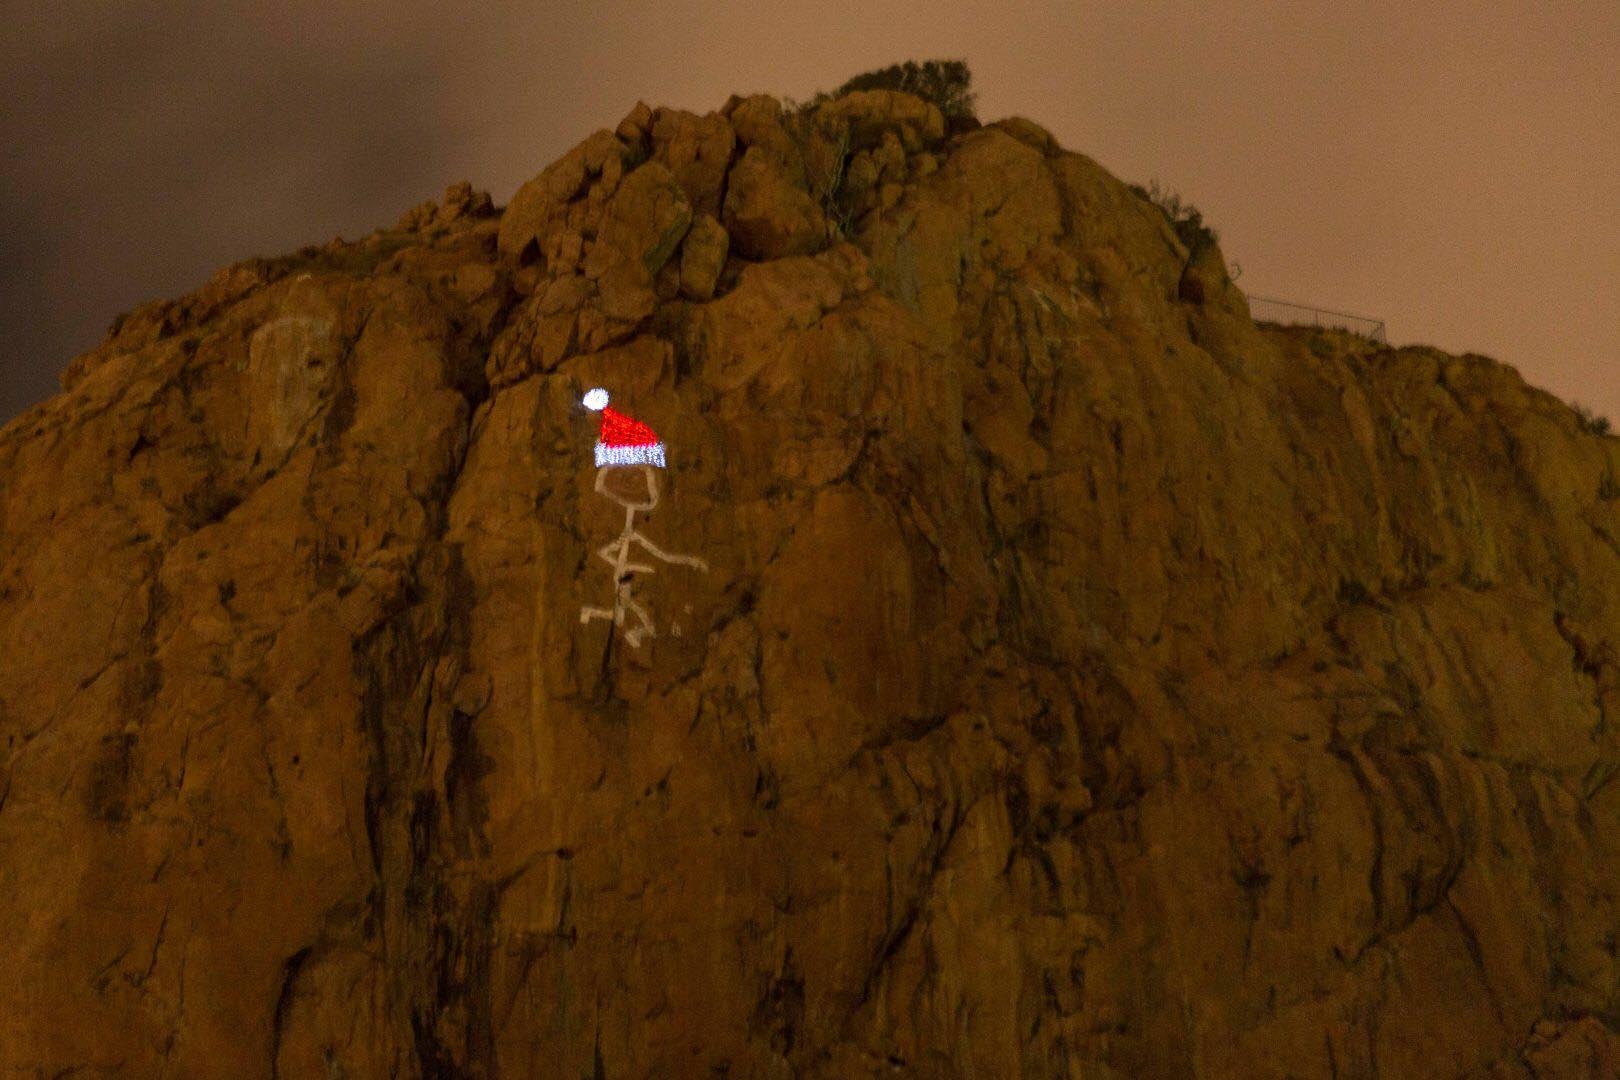 castle hill the saint christmas hat illuminated